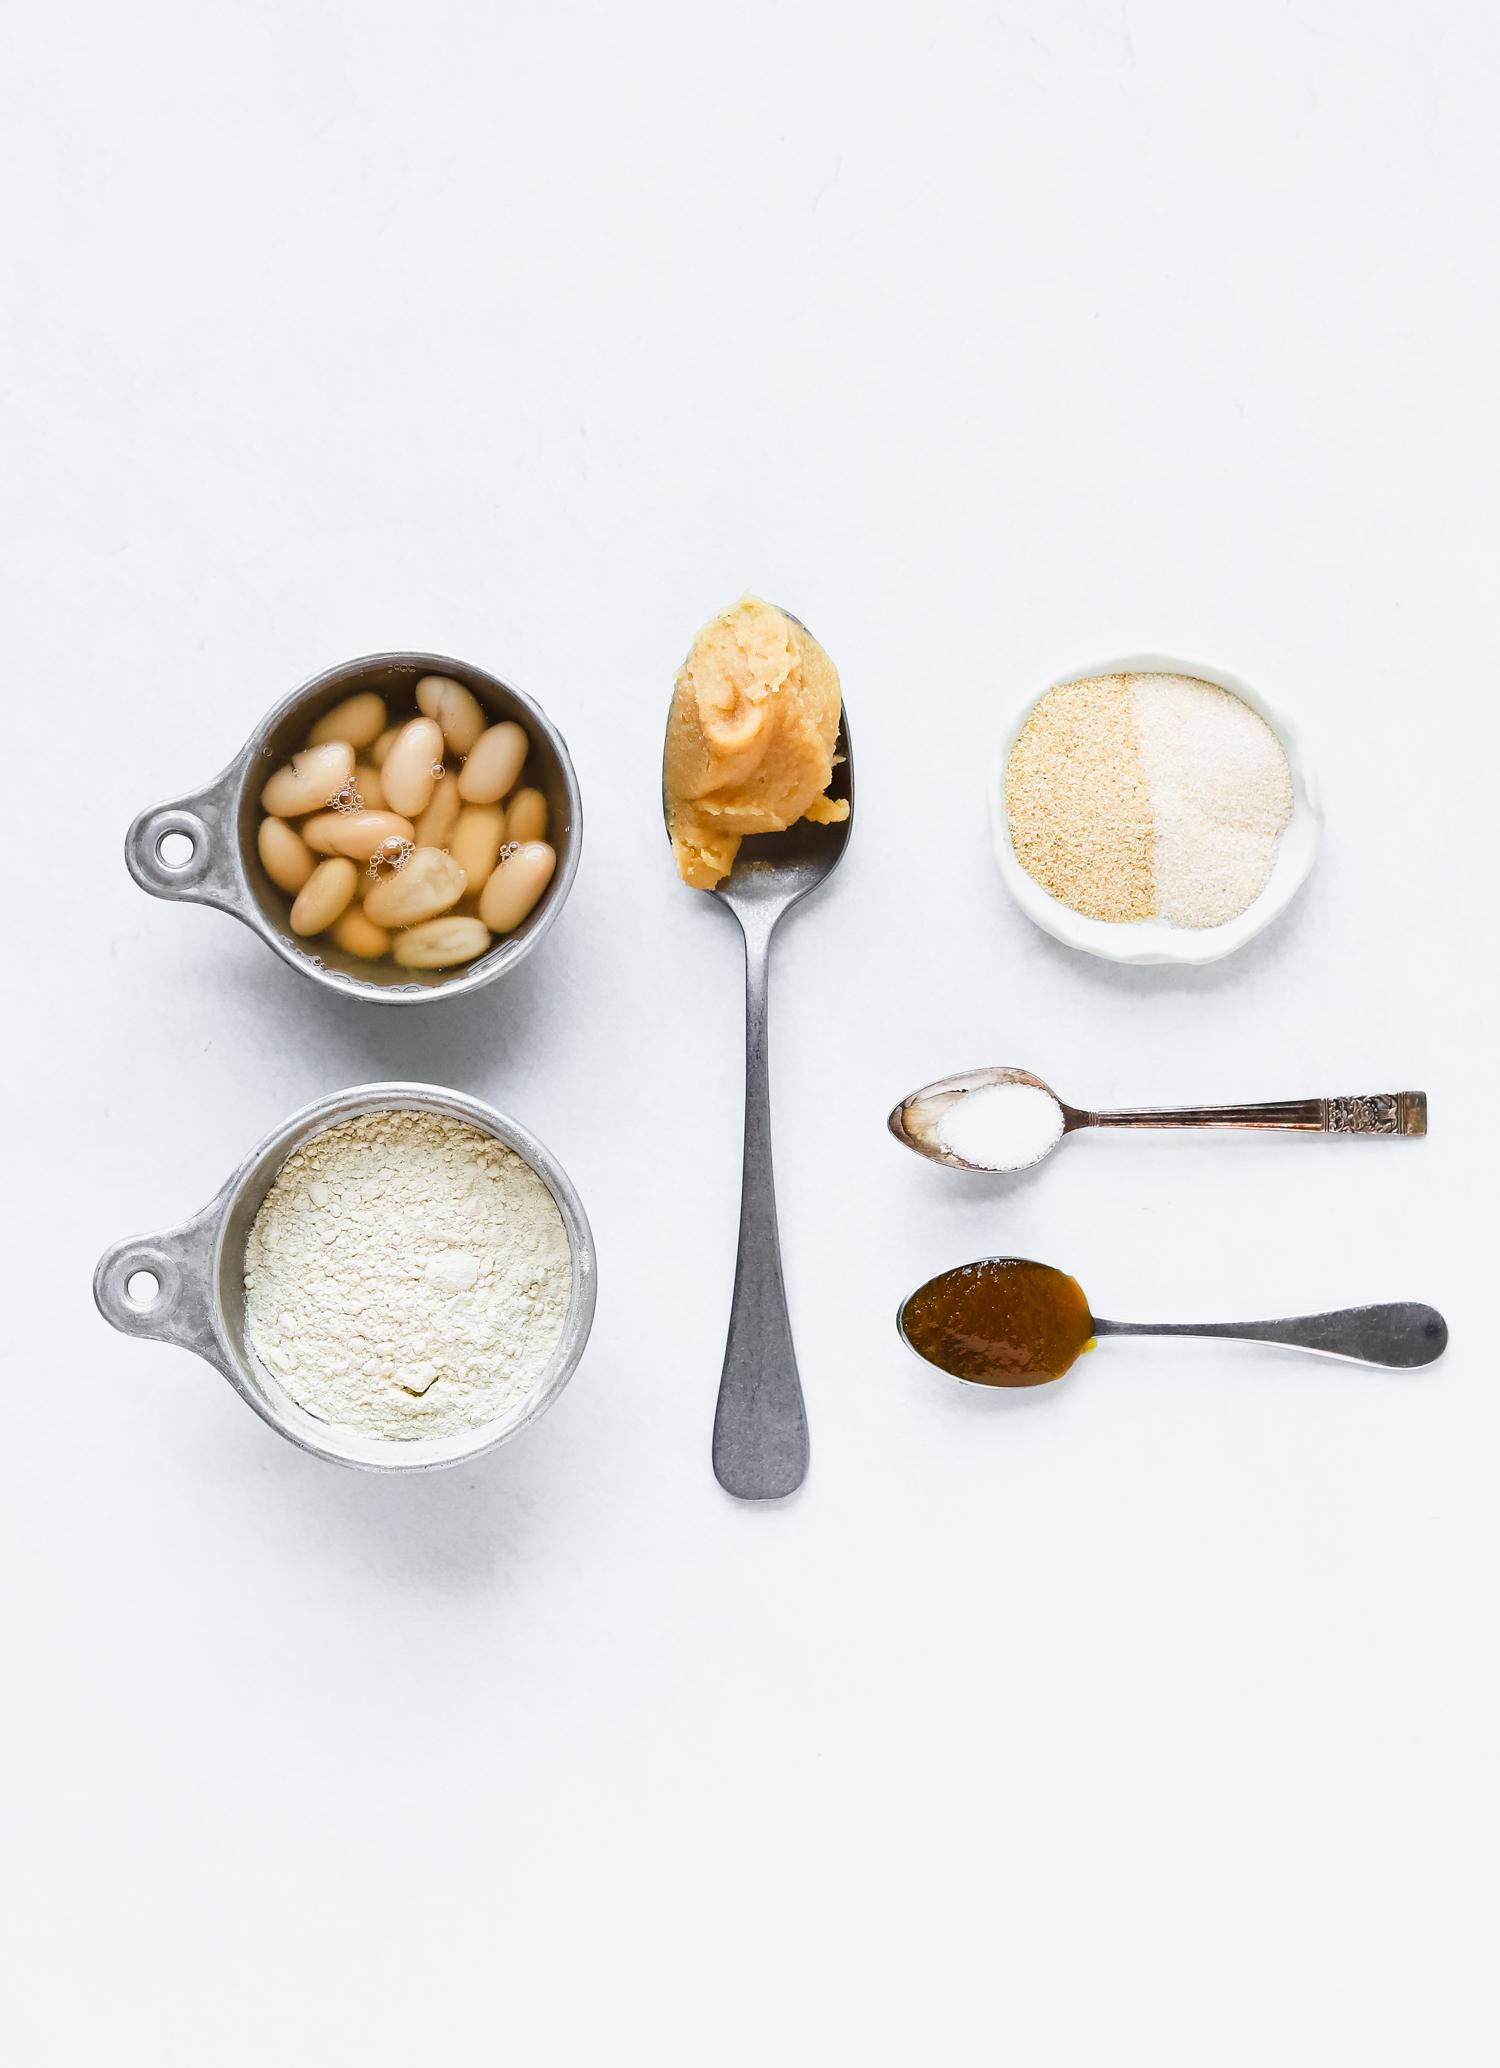 Ingredients for making vegan seitan chicken